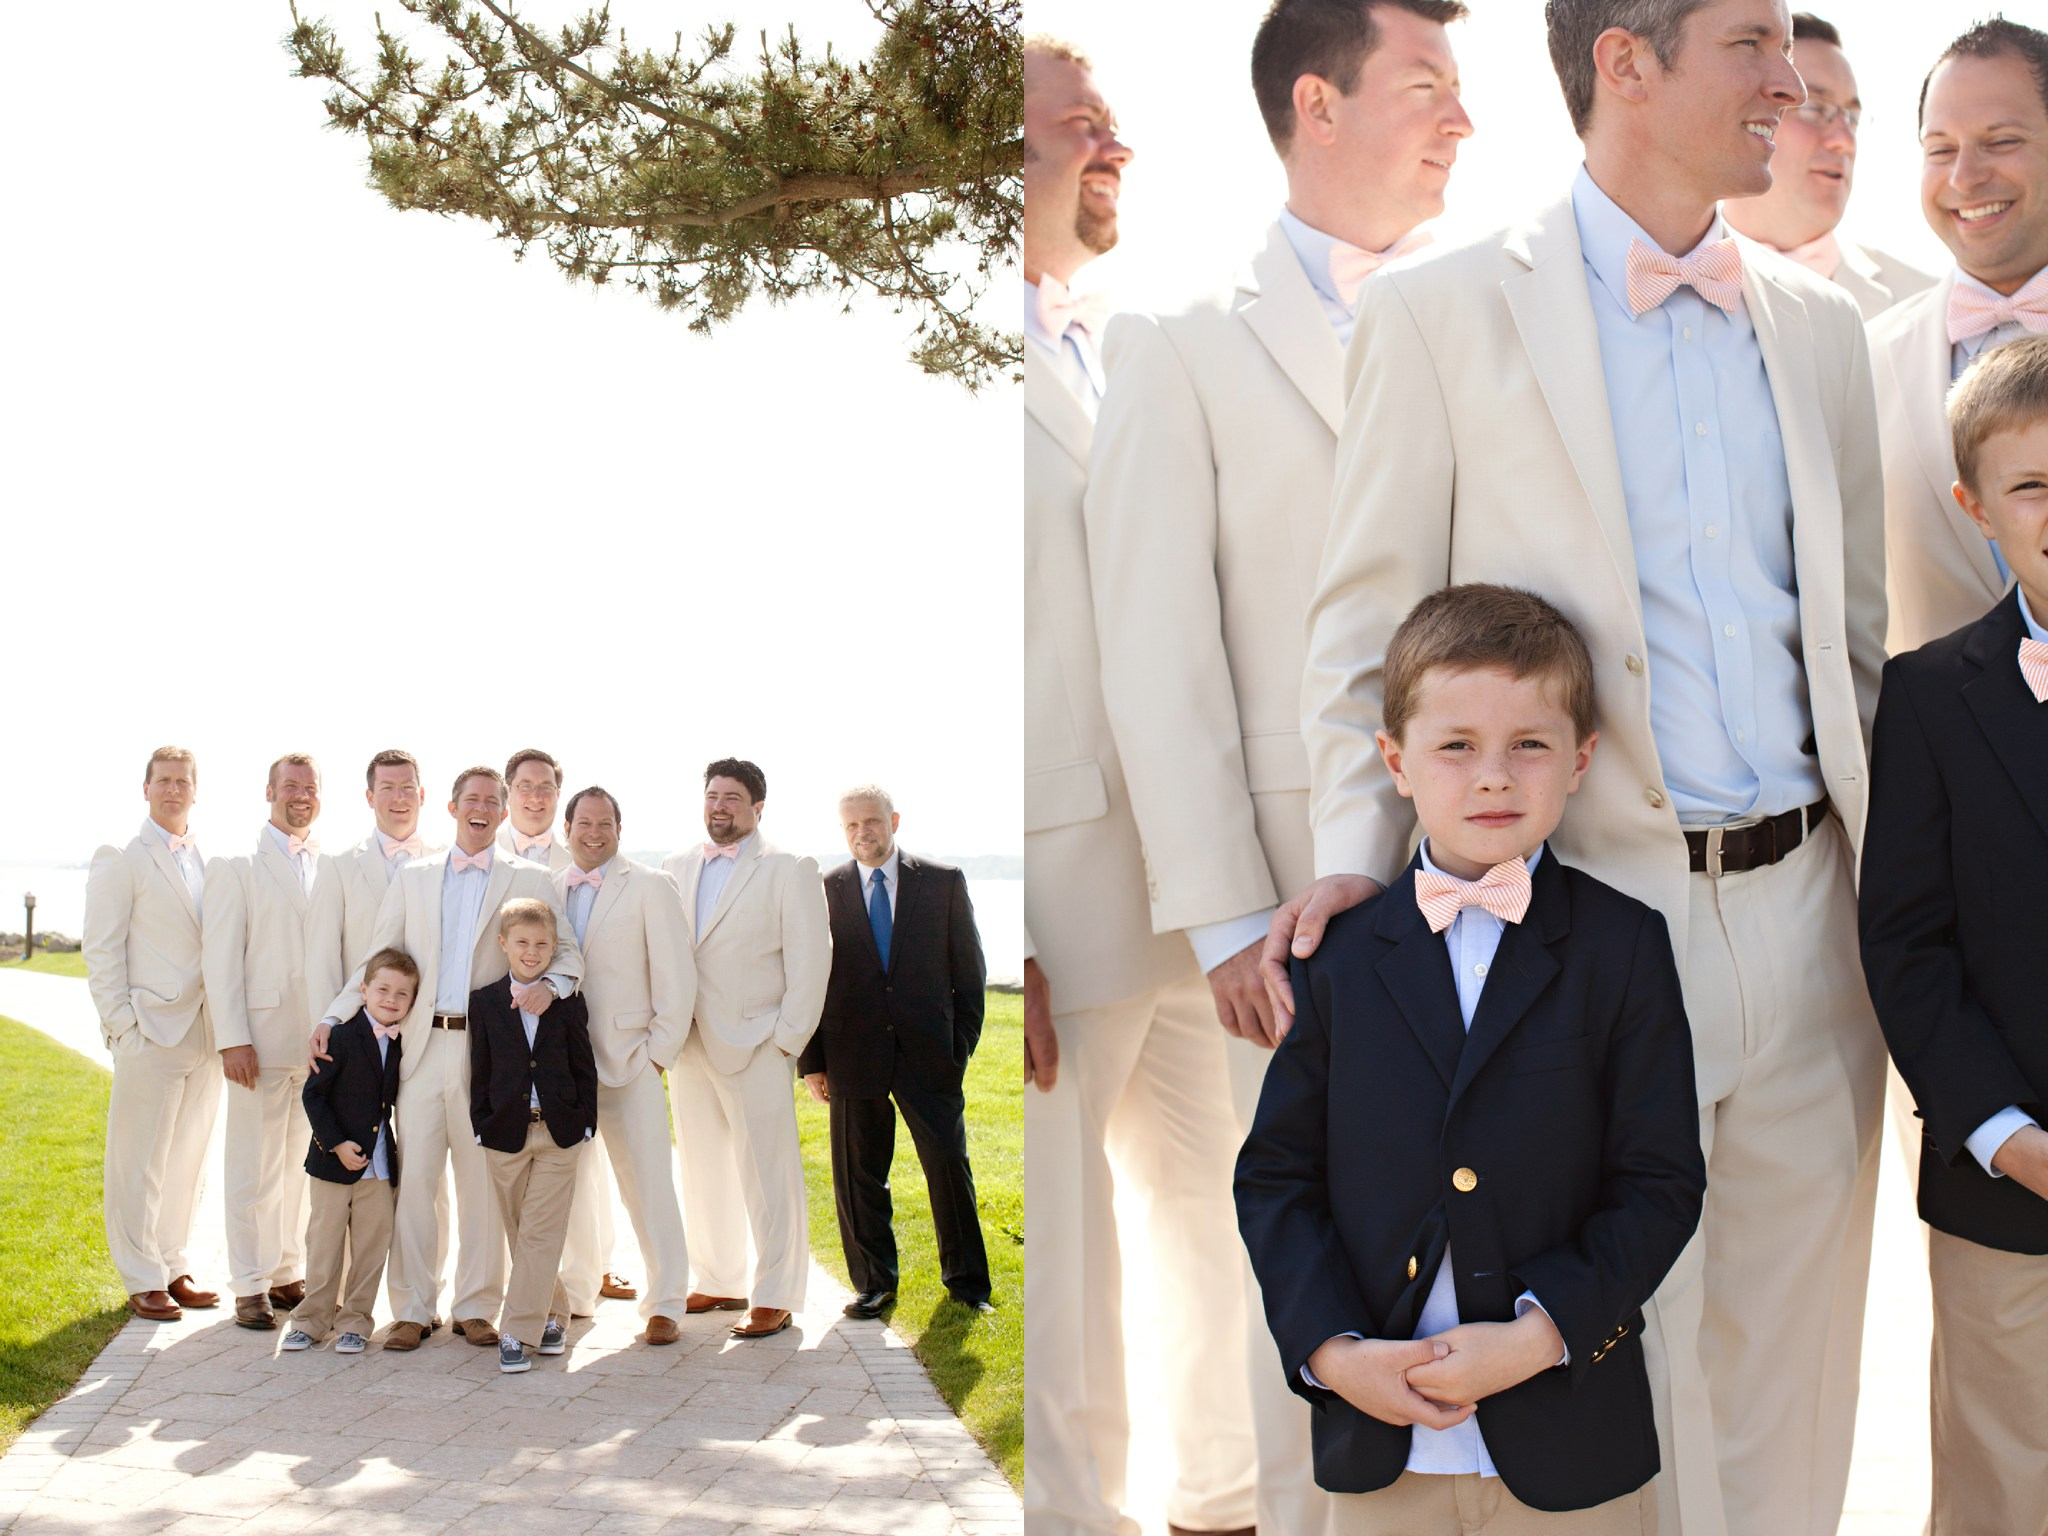 newport_harbor_wedding_00010.JPG